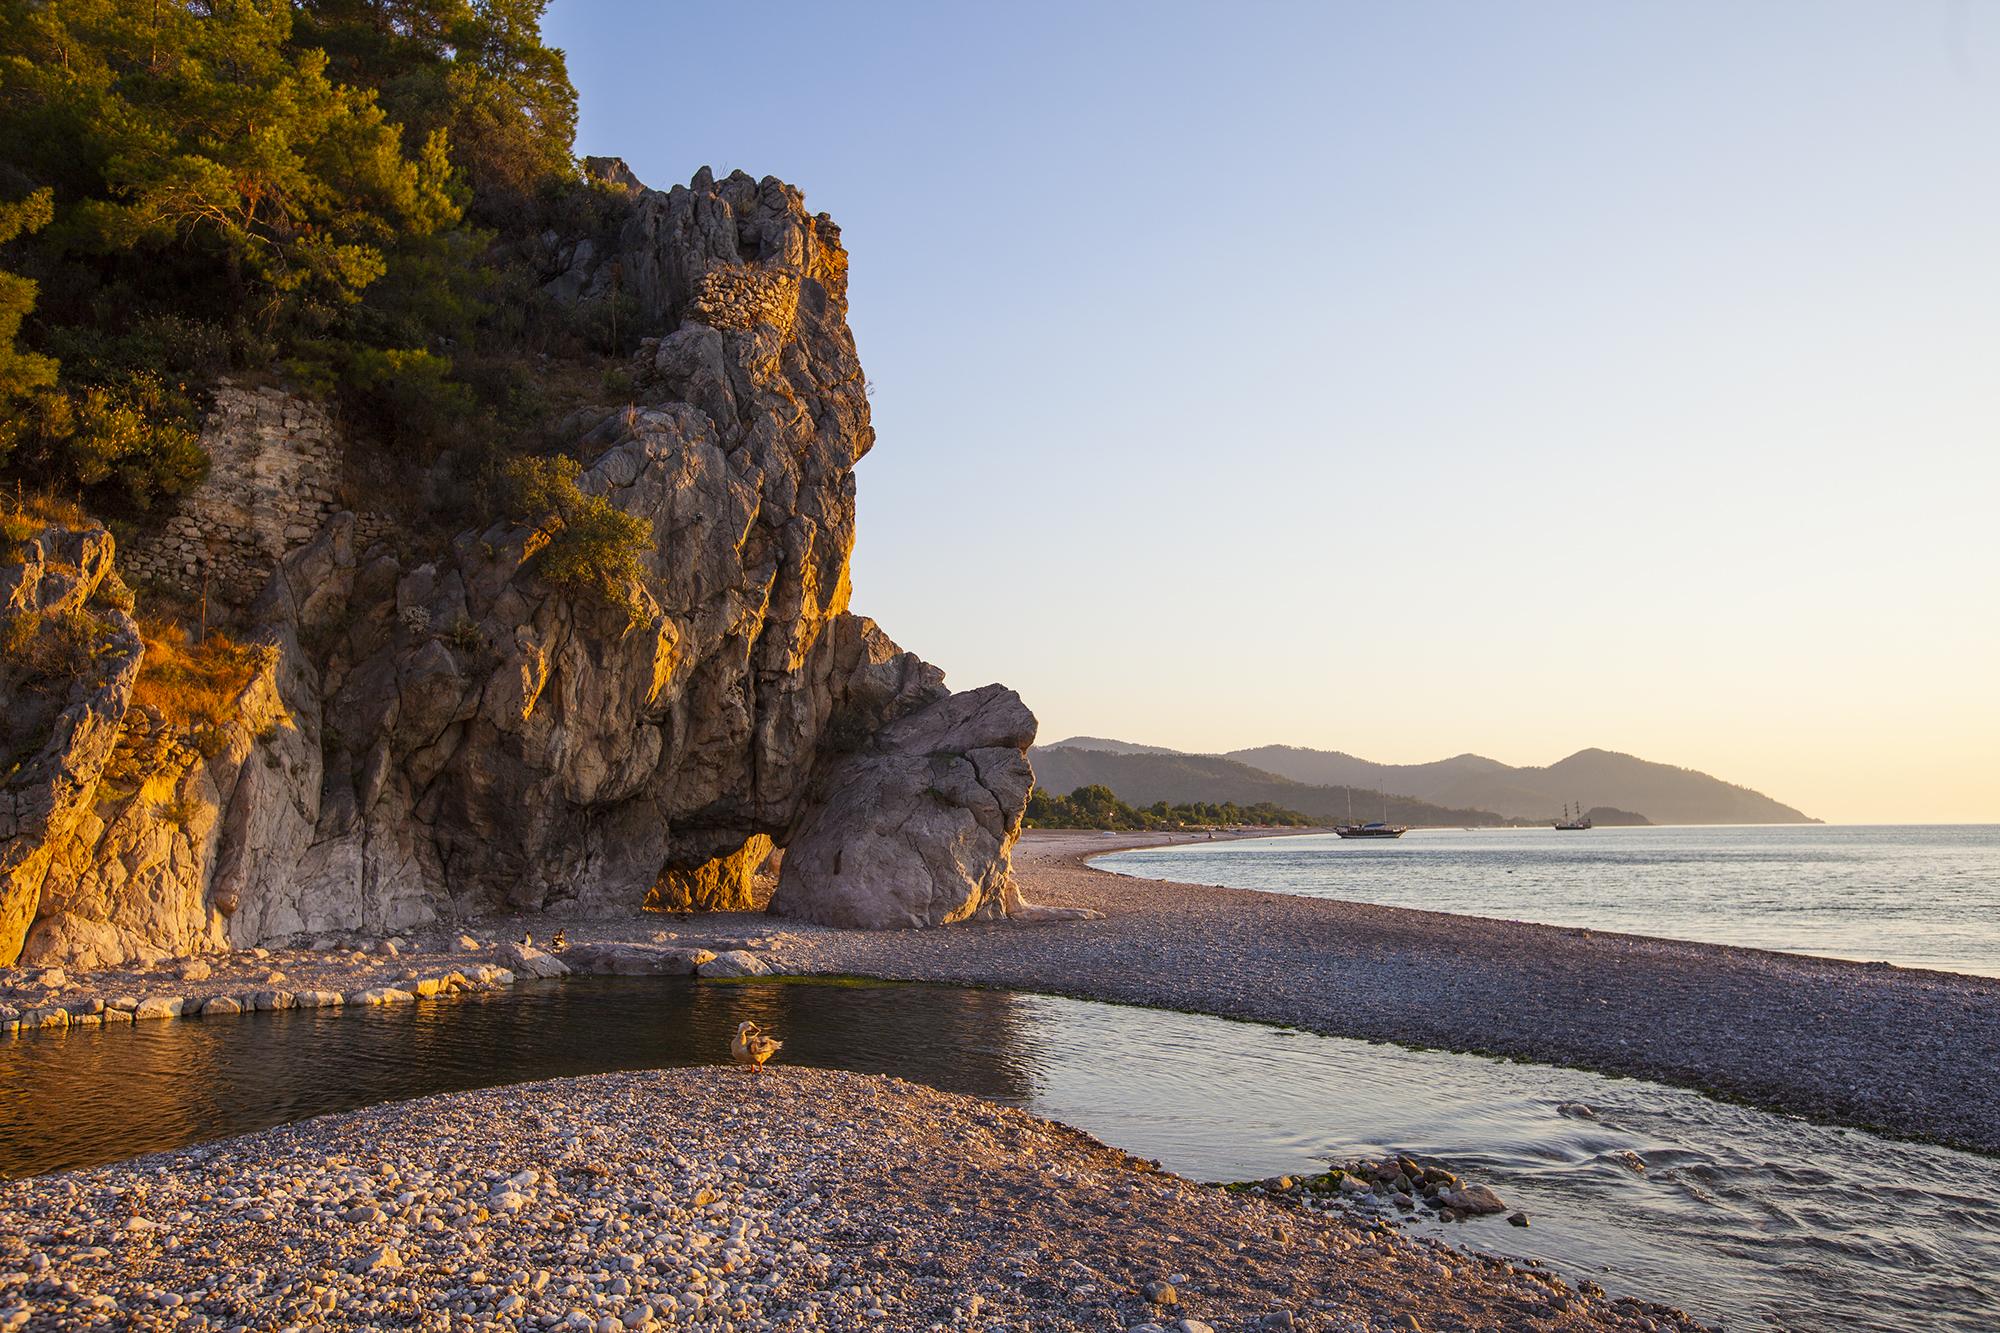 Natural arch in the rock, Cirali beach, Turkey